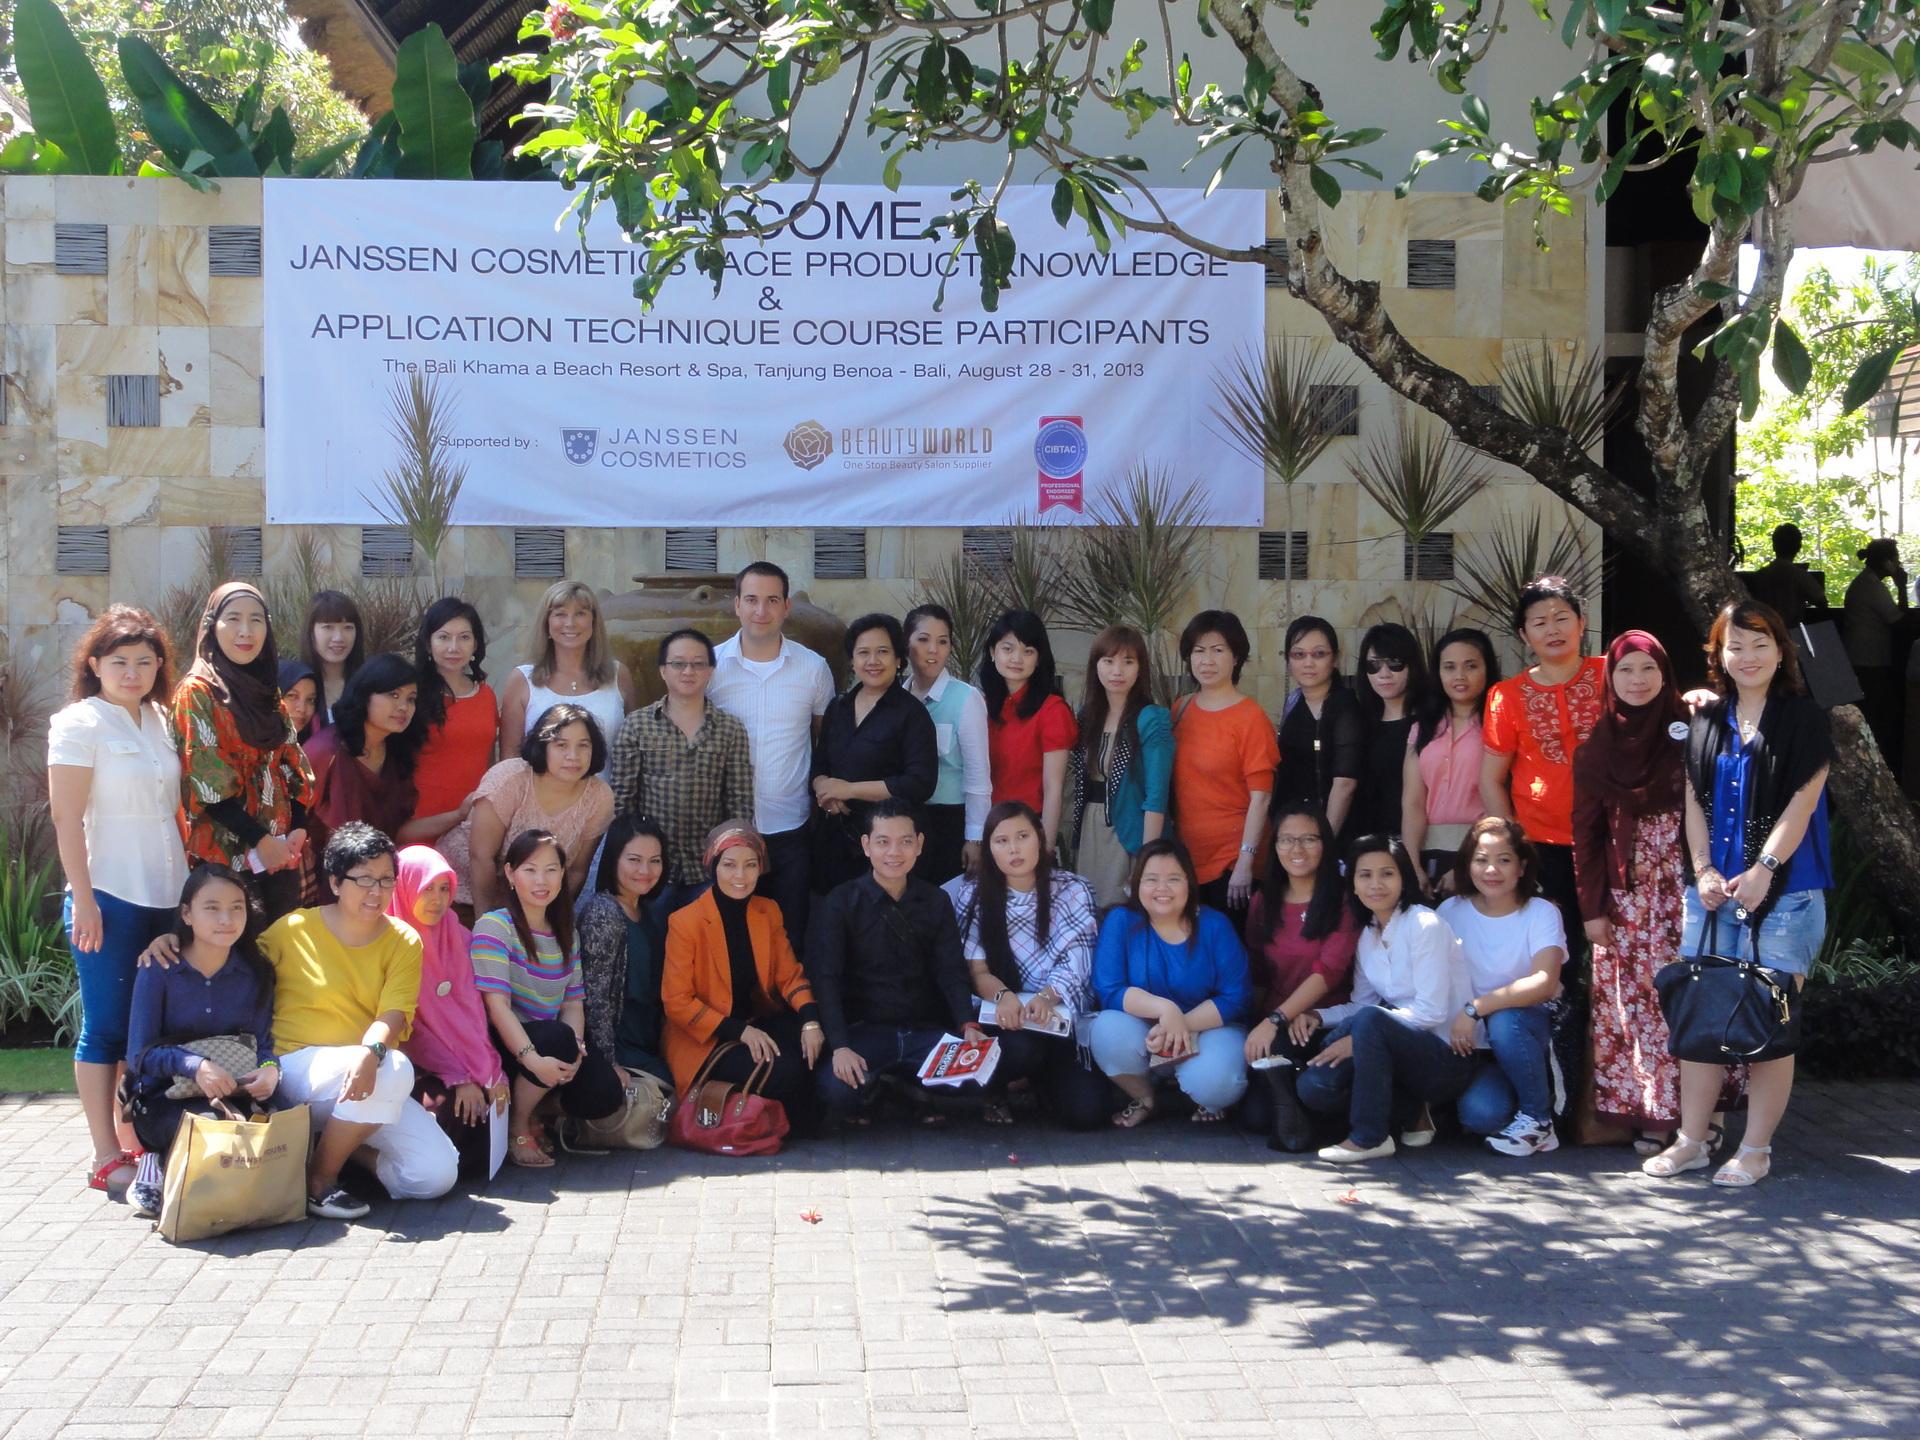 Reinhard in Indonesia 2013